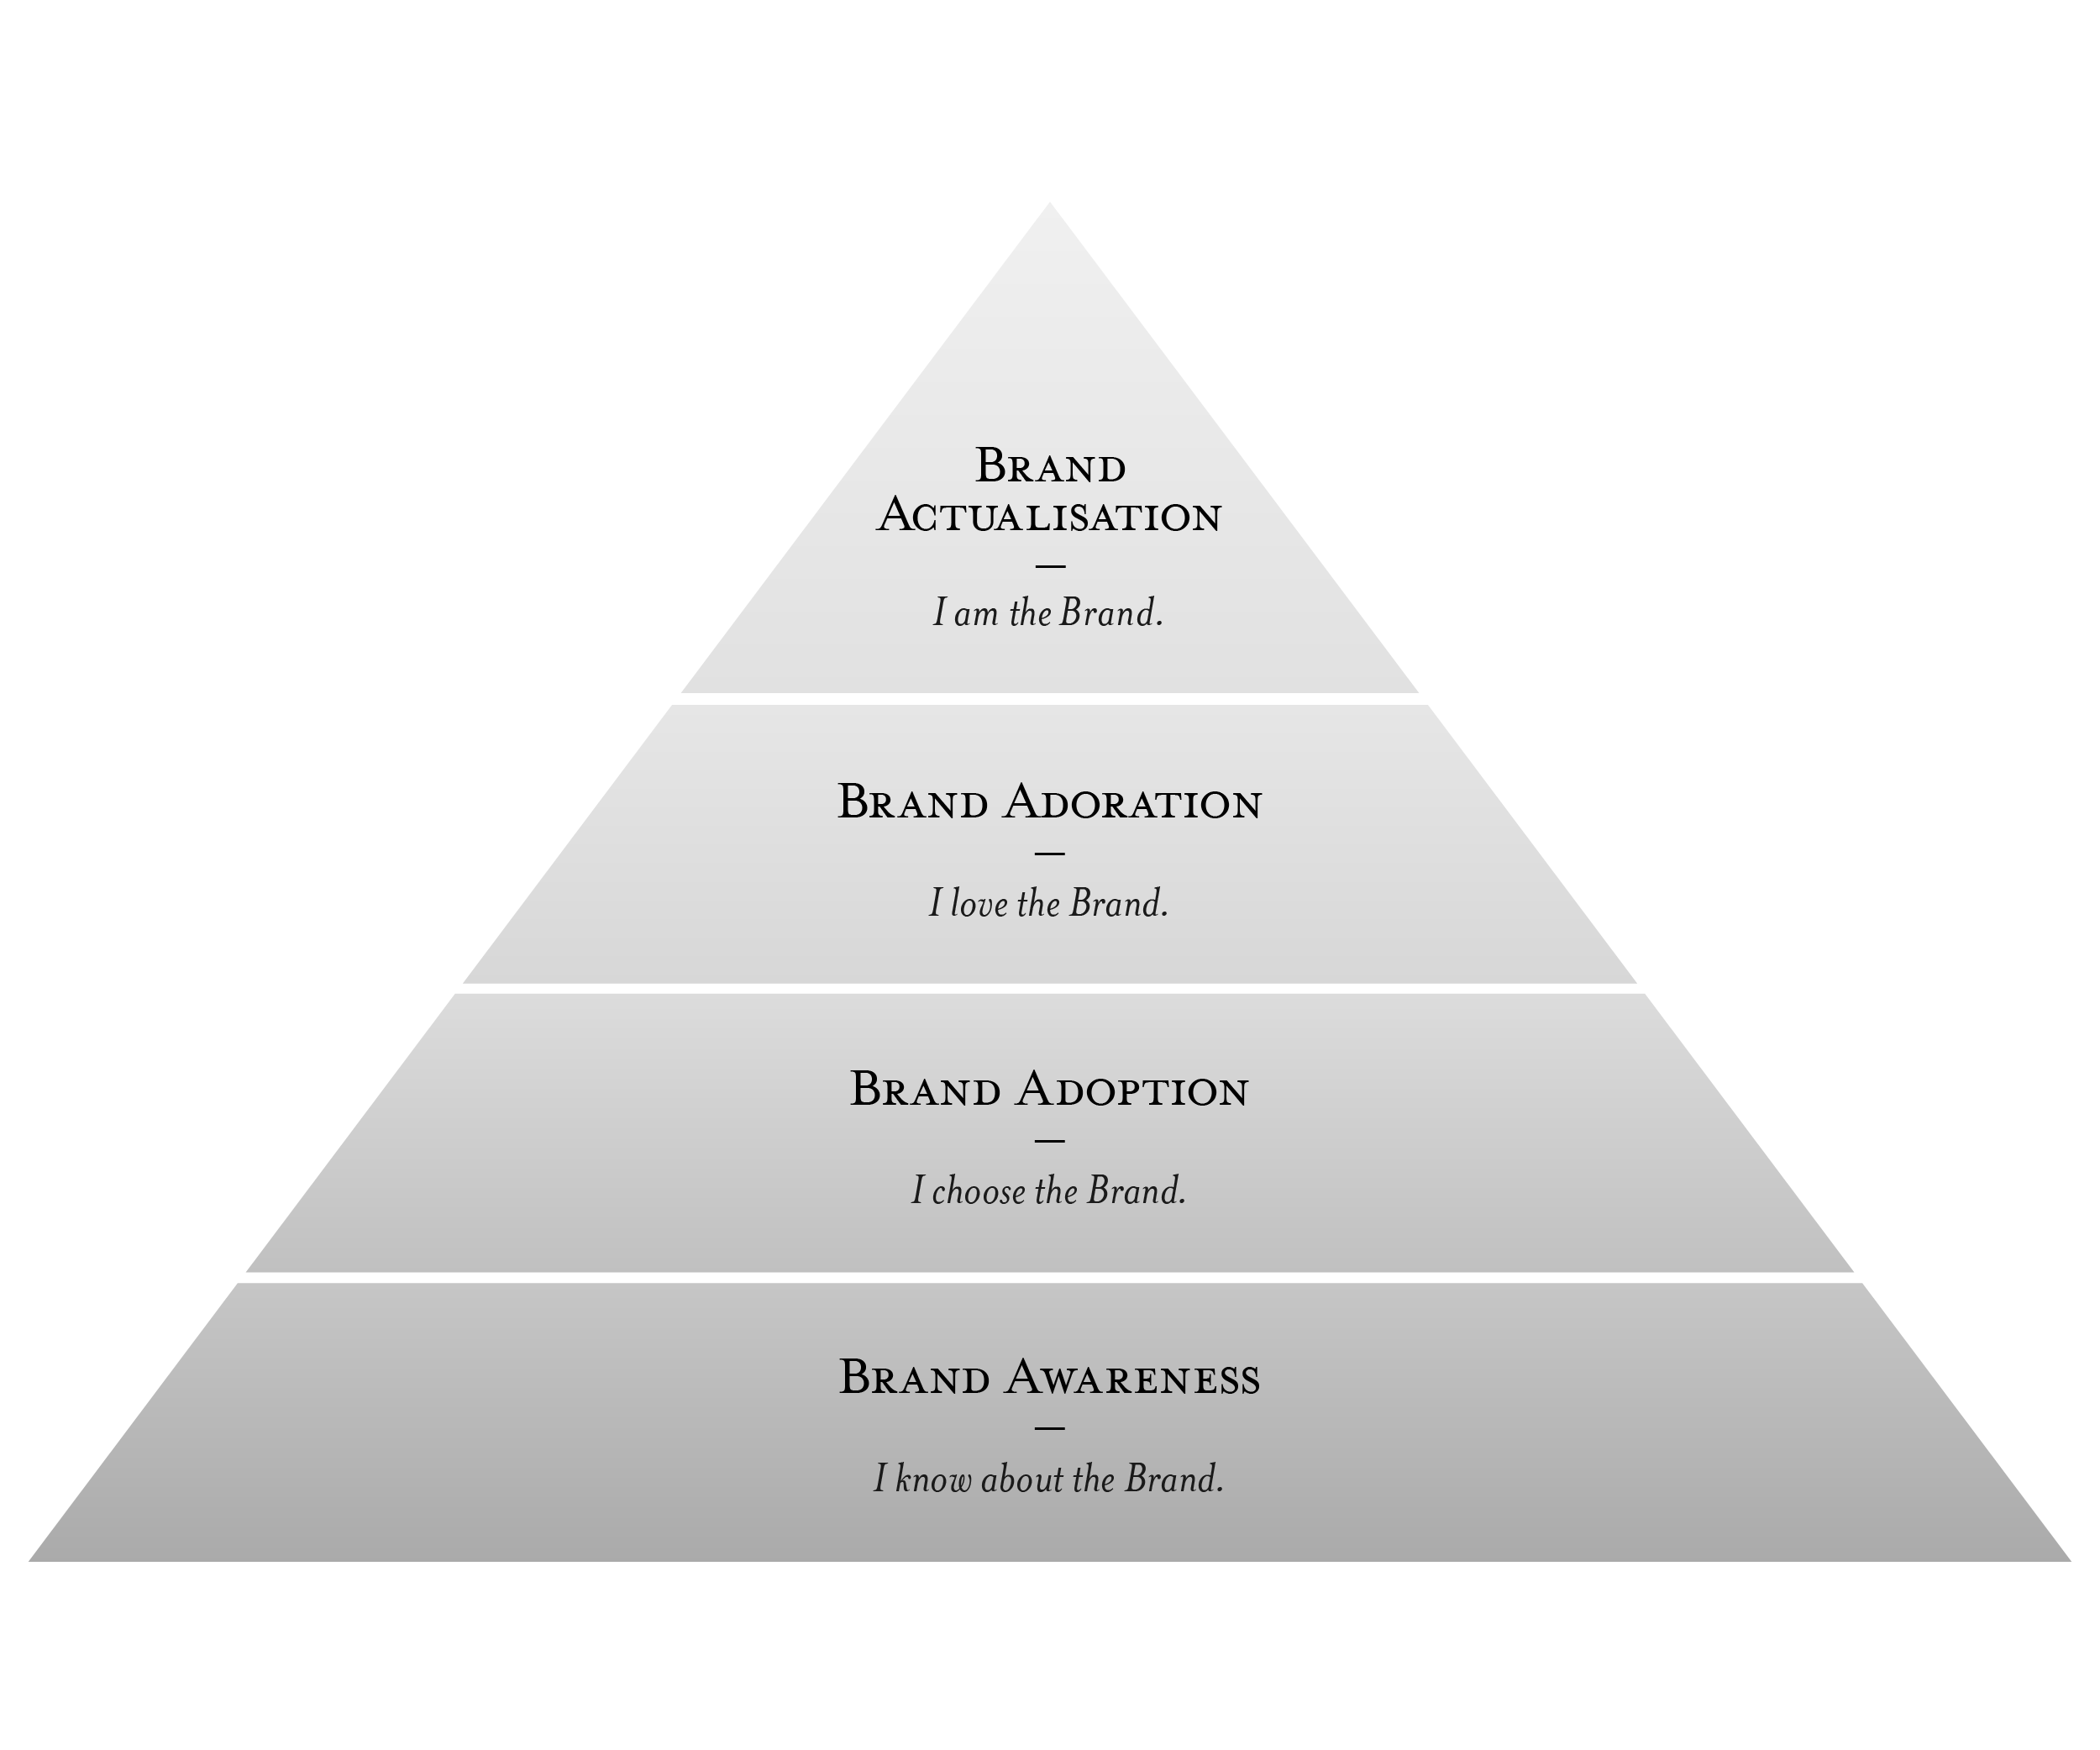 brandgrammar-pyramid2-05